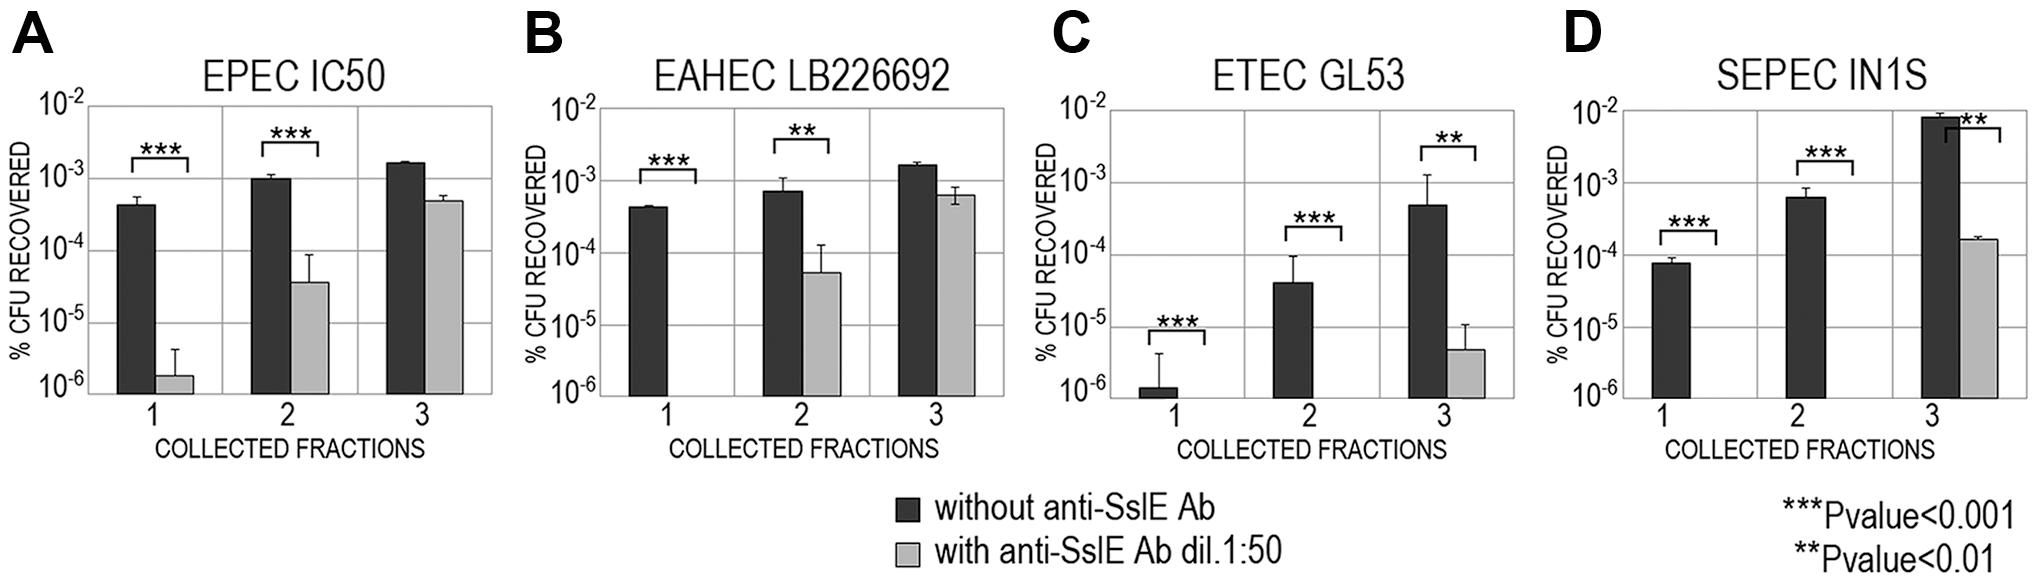 Cross-inhibition of <i>E. coli</i> translocation through a mucin-gel matrix by anti-SslE<sub>IHE3034</sub> (belonging to variant I) antibodies.